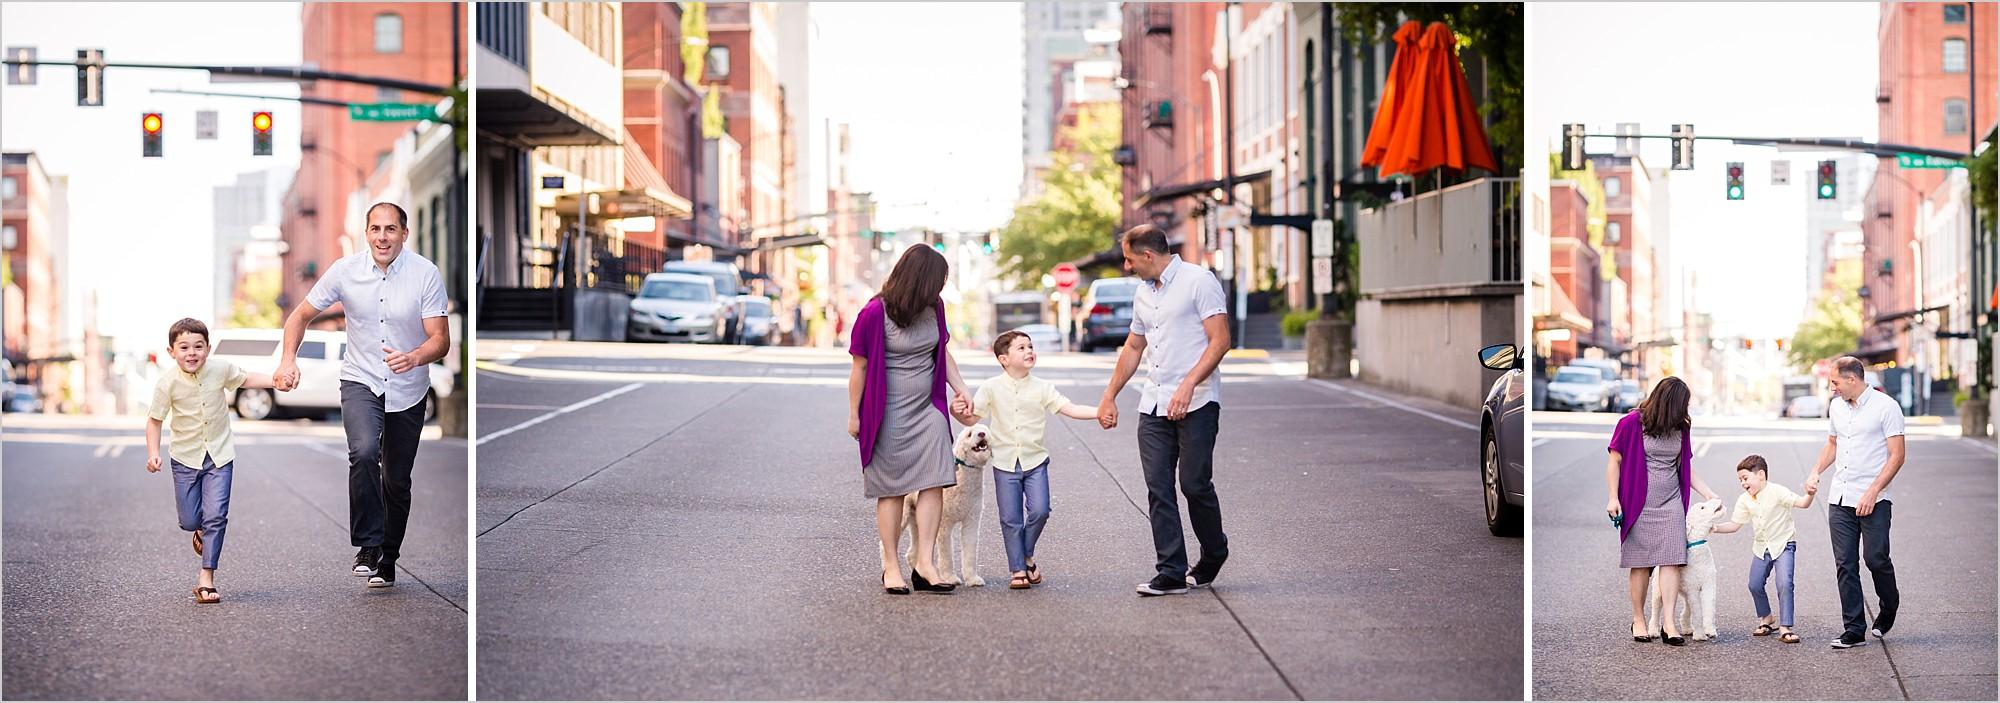 family having fun in downtown portland oregon on summer morning by rebecca hunnicutt farren